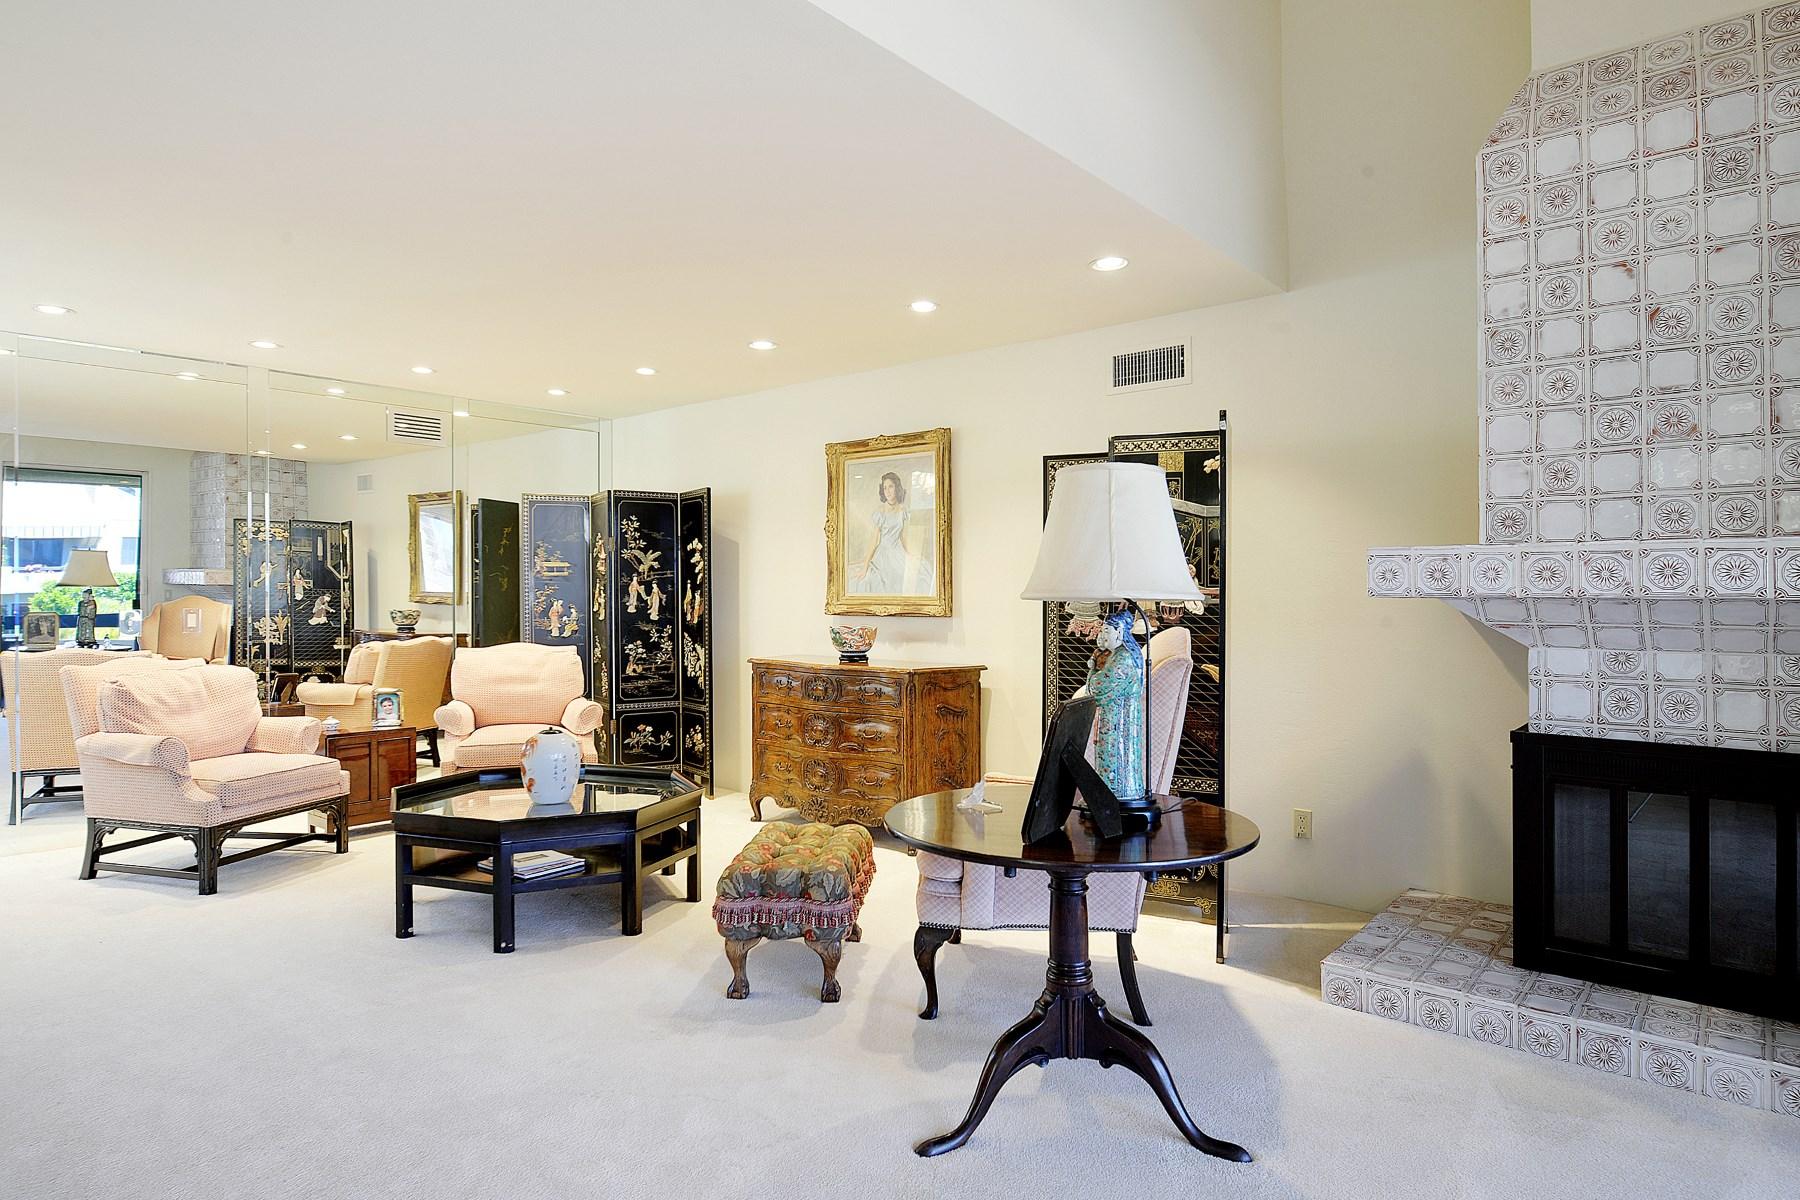 Condominium for Sale at Luxury Century City Penthouse 2390 Century Hill Los Angeles, California, 90067 United States